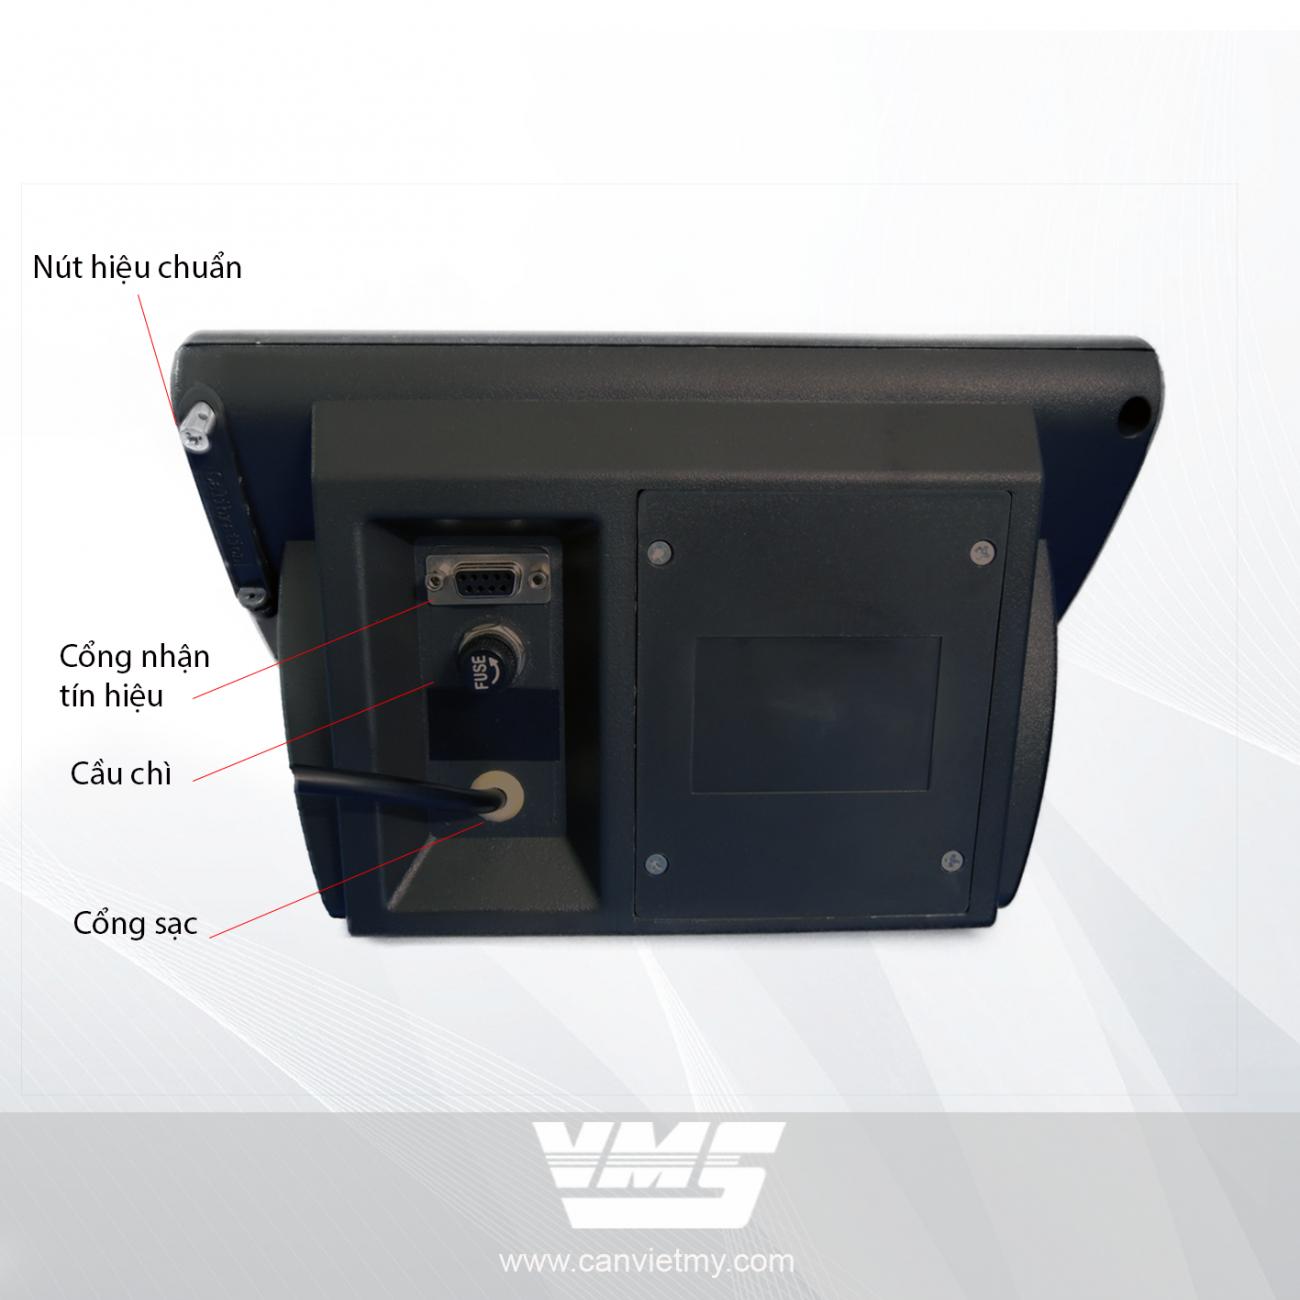 ĐẦU CÂN ĐIỆN TỬ XK3190A 15 slide 0